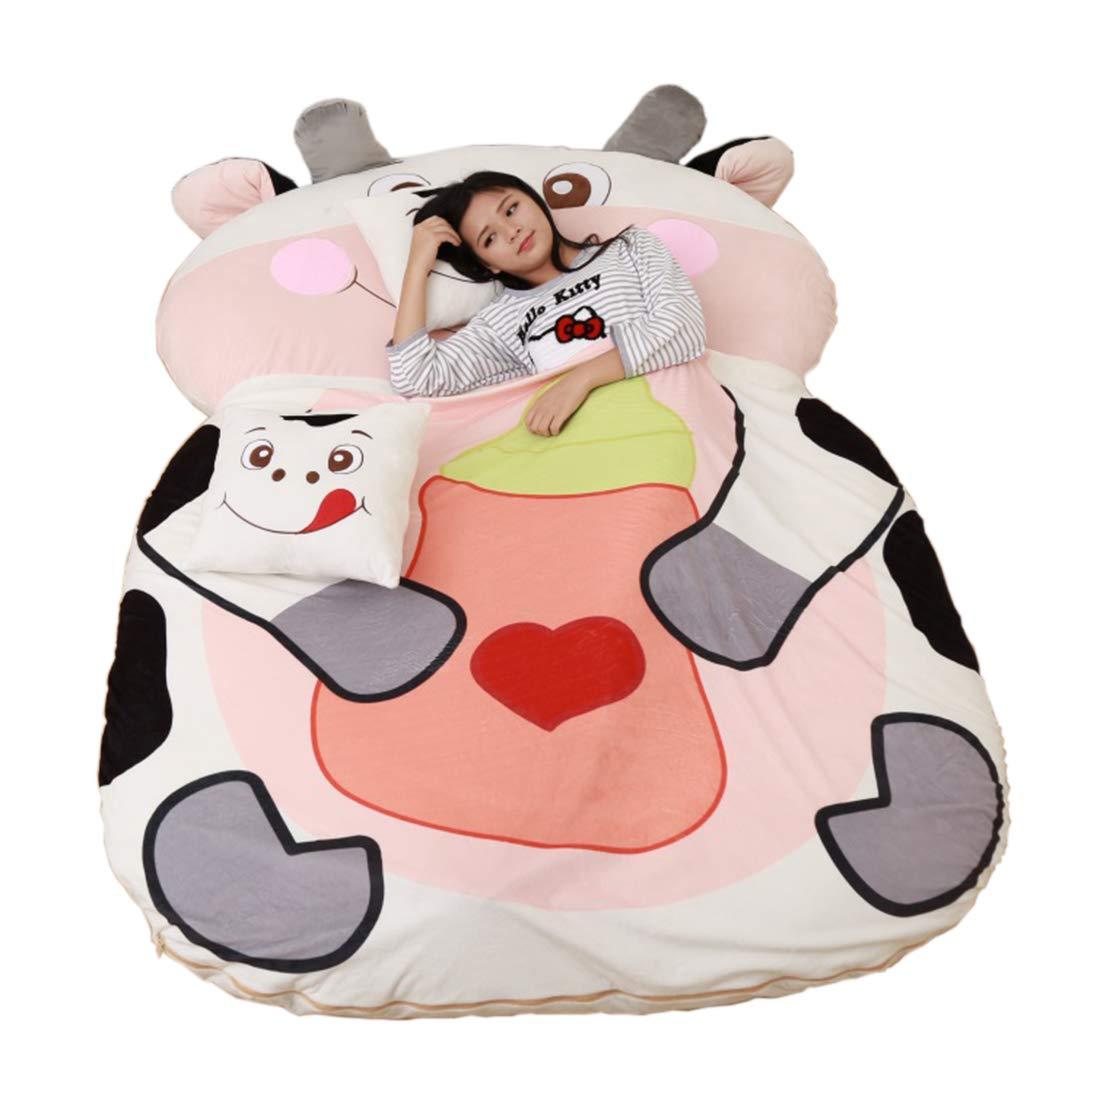 Alkem Christmas Cartoon Cow Bed Double Bean Bag Soft Mattress for Children by Alkem (Image #2)